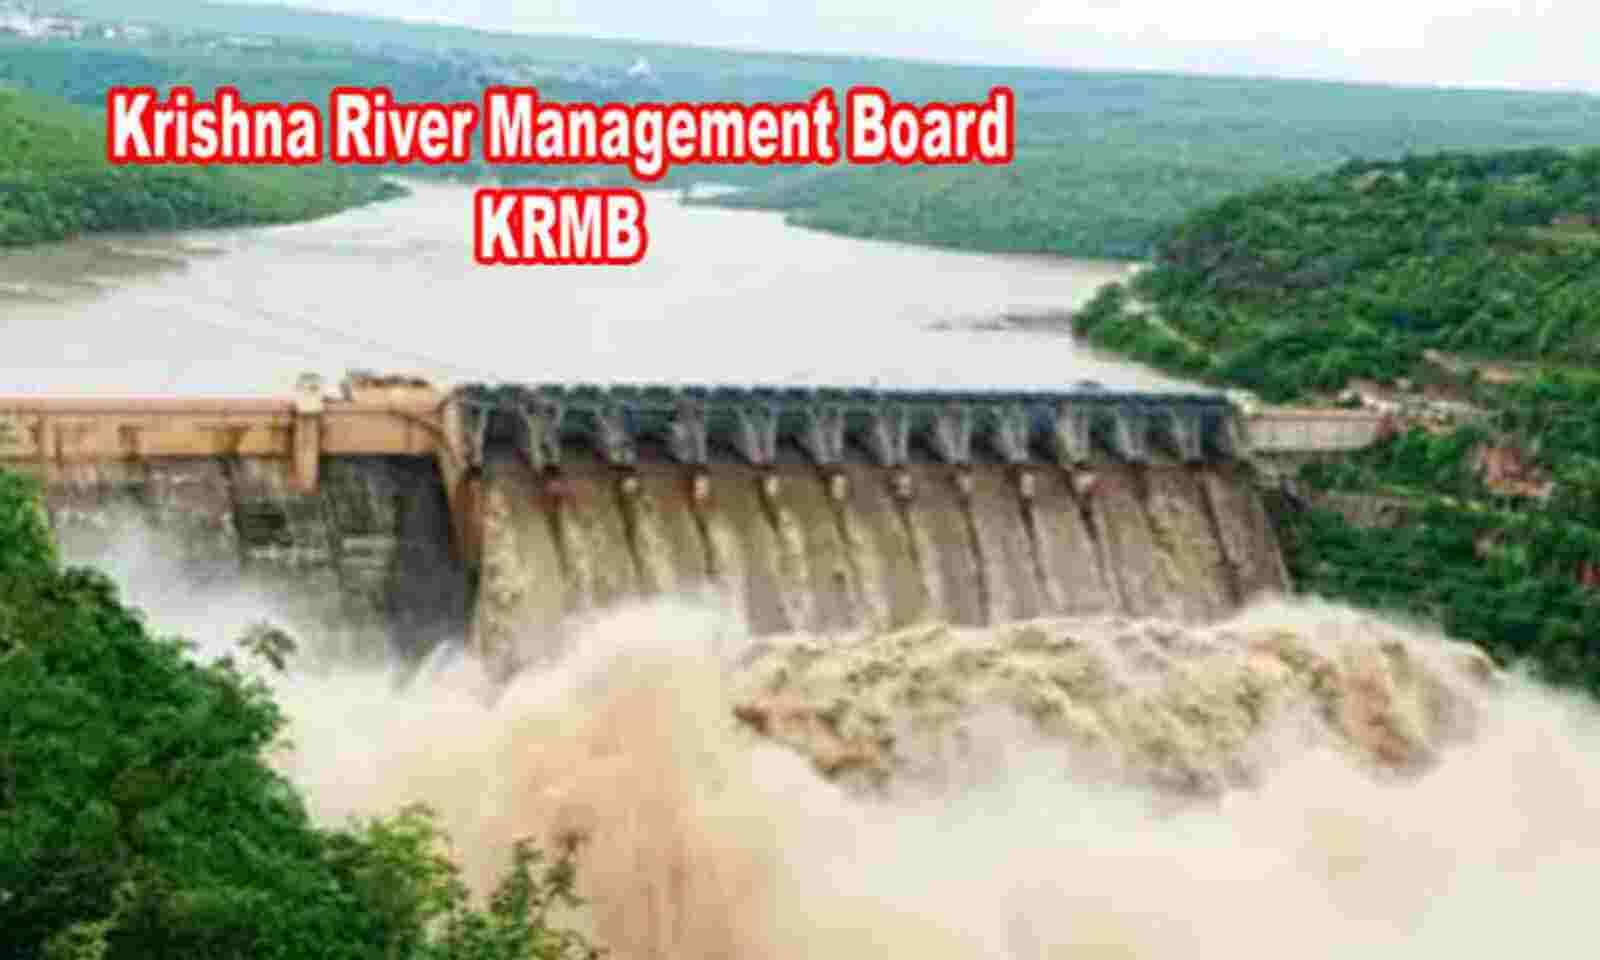 Telangana govt seeks more changes in purview of Krishna River Management Board